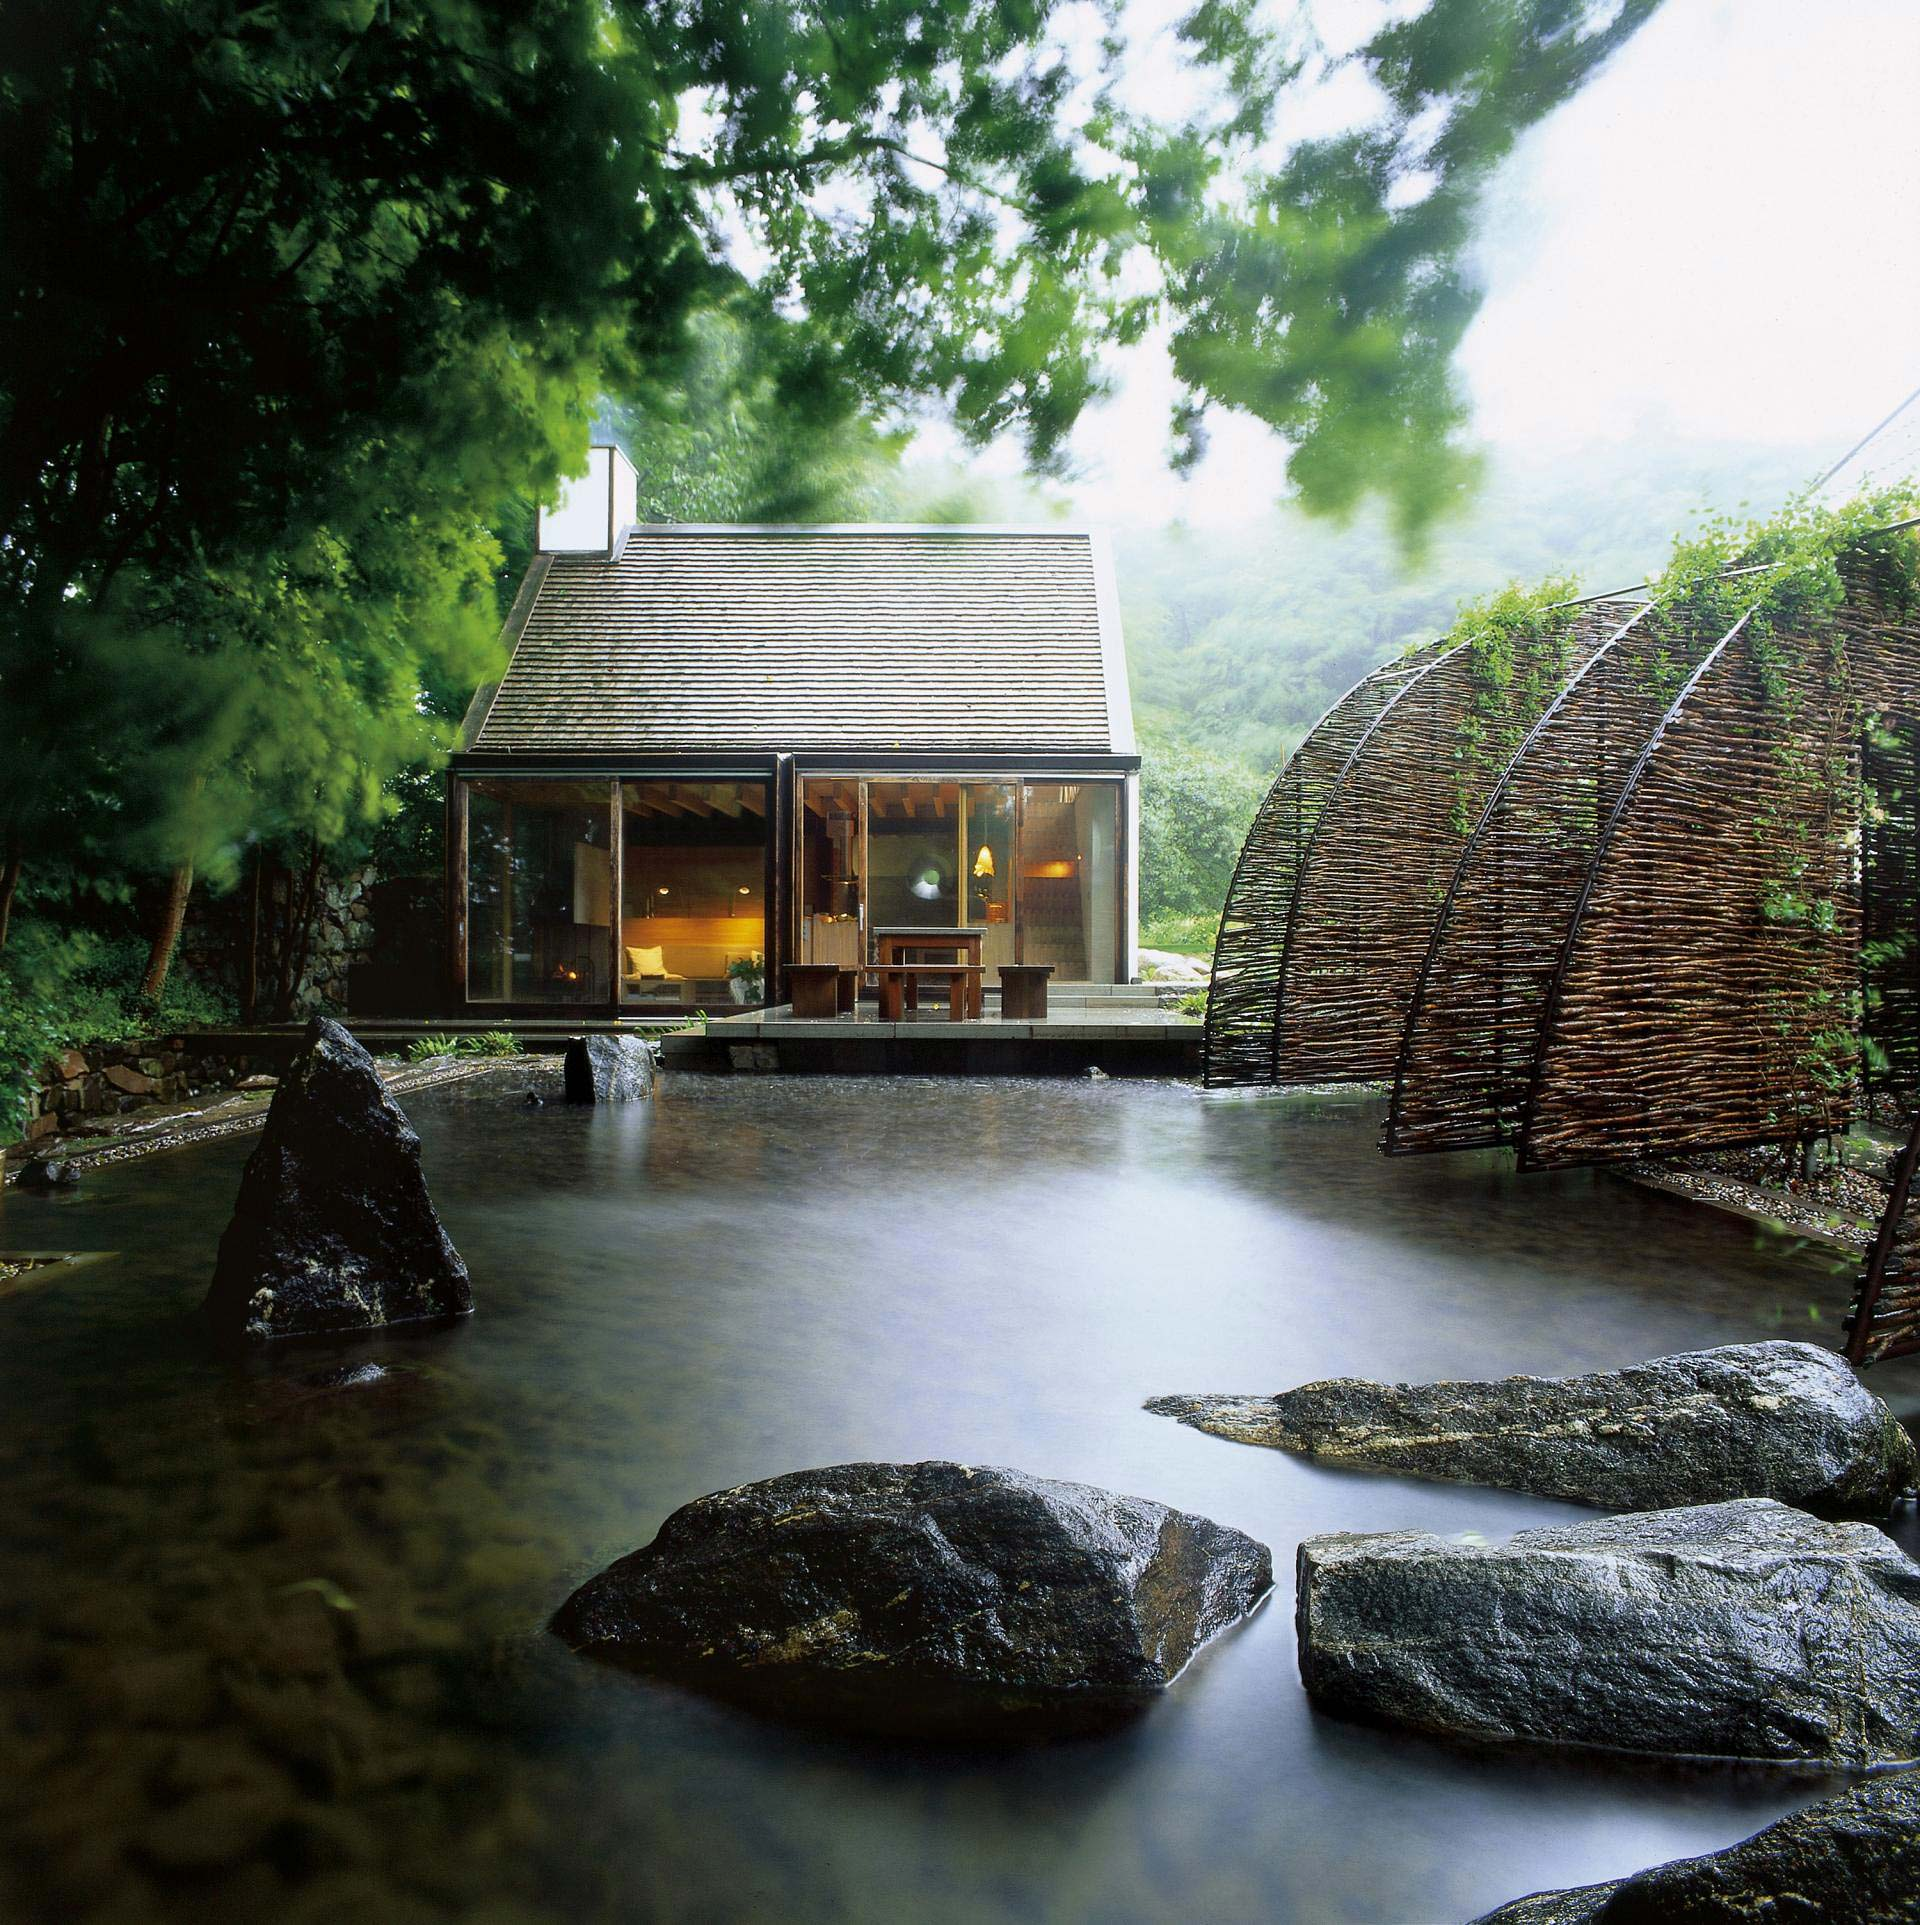 The Mill House by Wingårdh Arkitektkontor